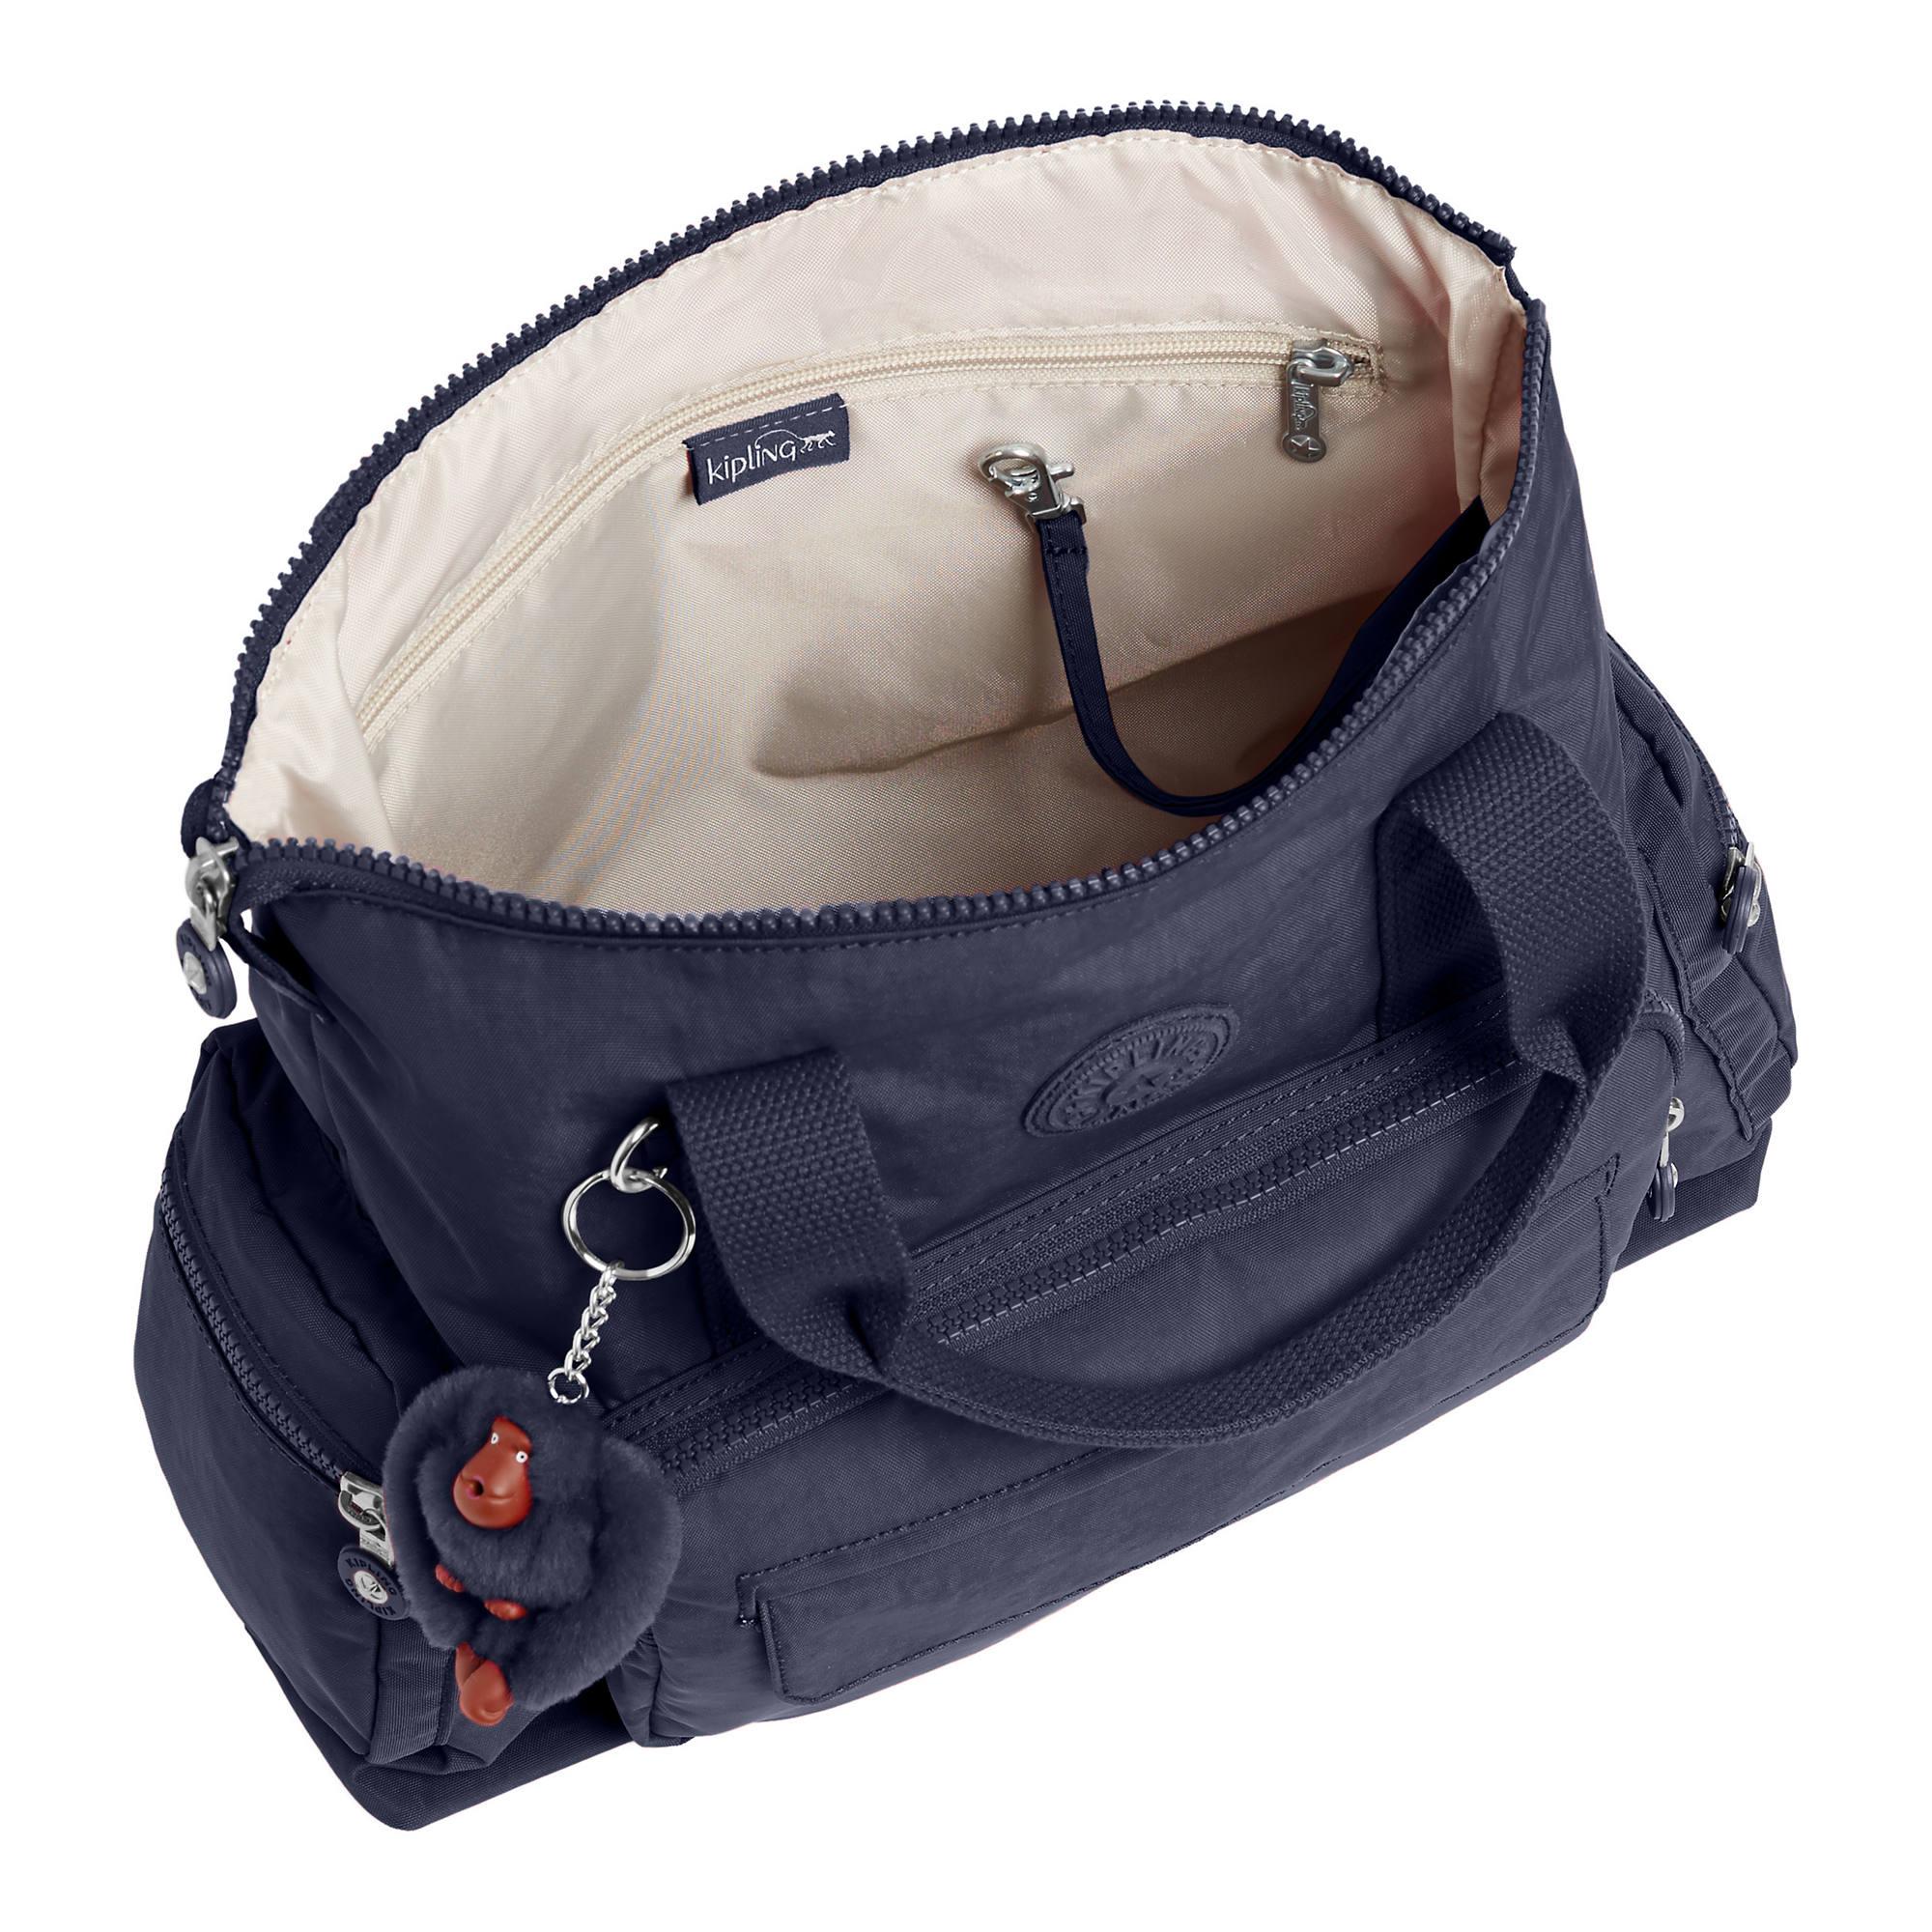 Kipling-Alvy-2-In-1-Convertible-Tote-Bag-Backpack miniatura 42